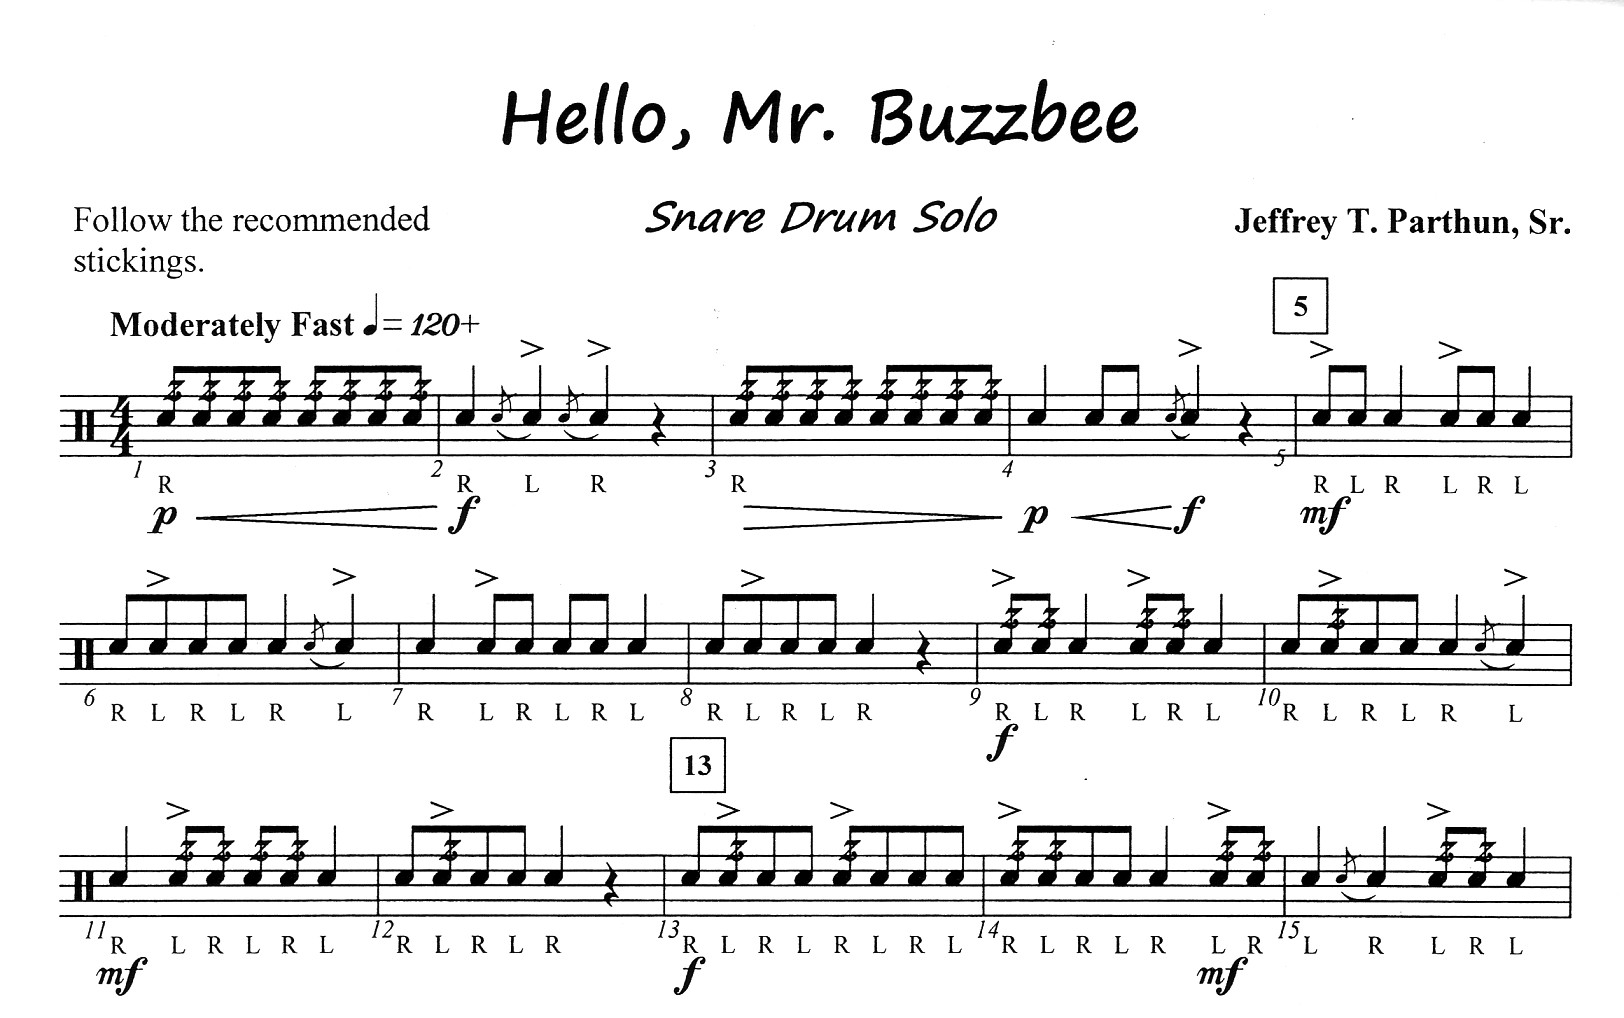 parthun jeffrey t hello mr buzzbee for snare drum solo brandt percussion noten versand. Black Bedroom Furniture Sets. Home Design Ideas